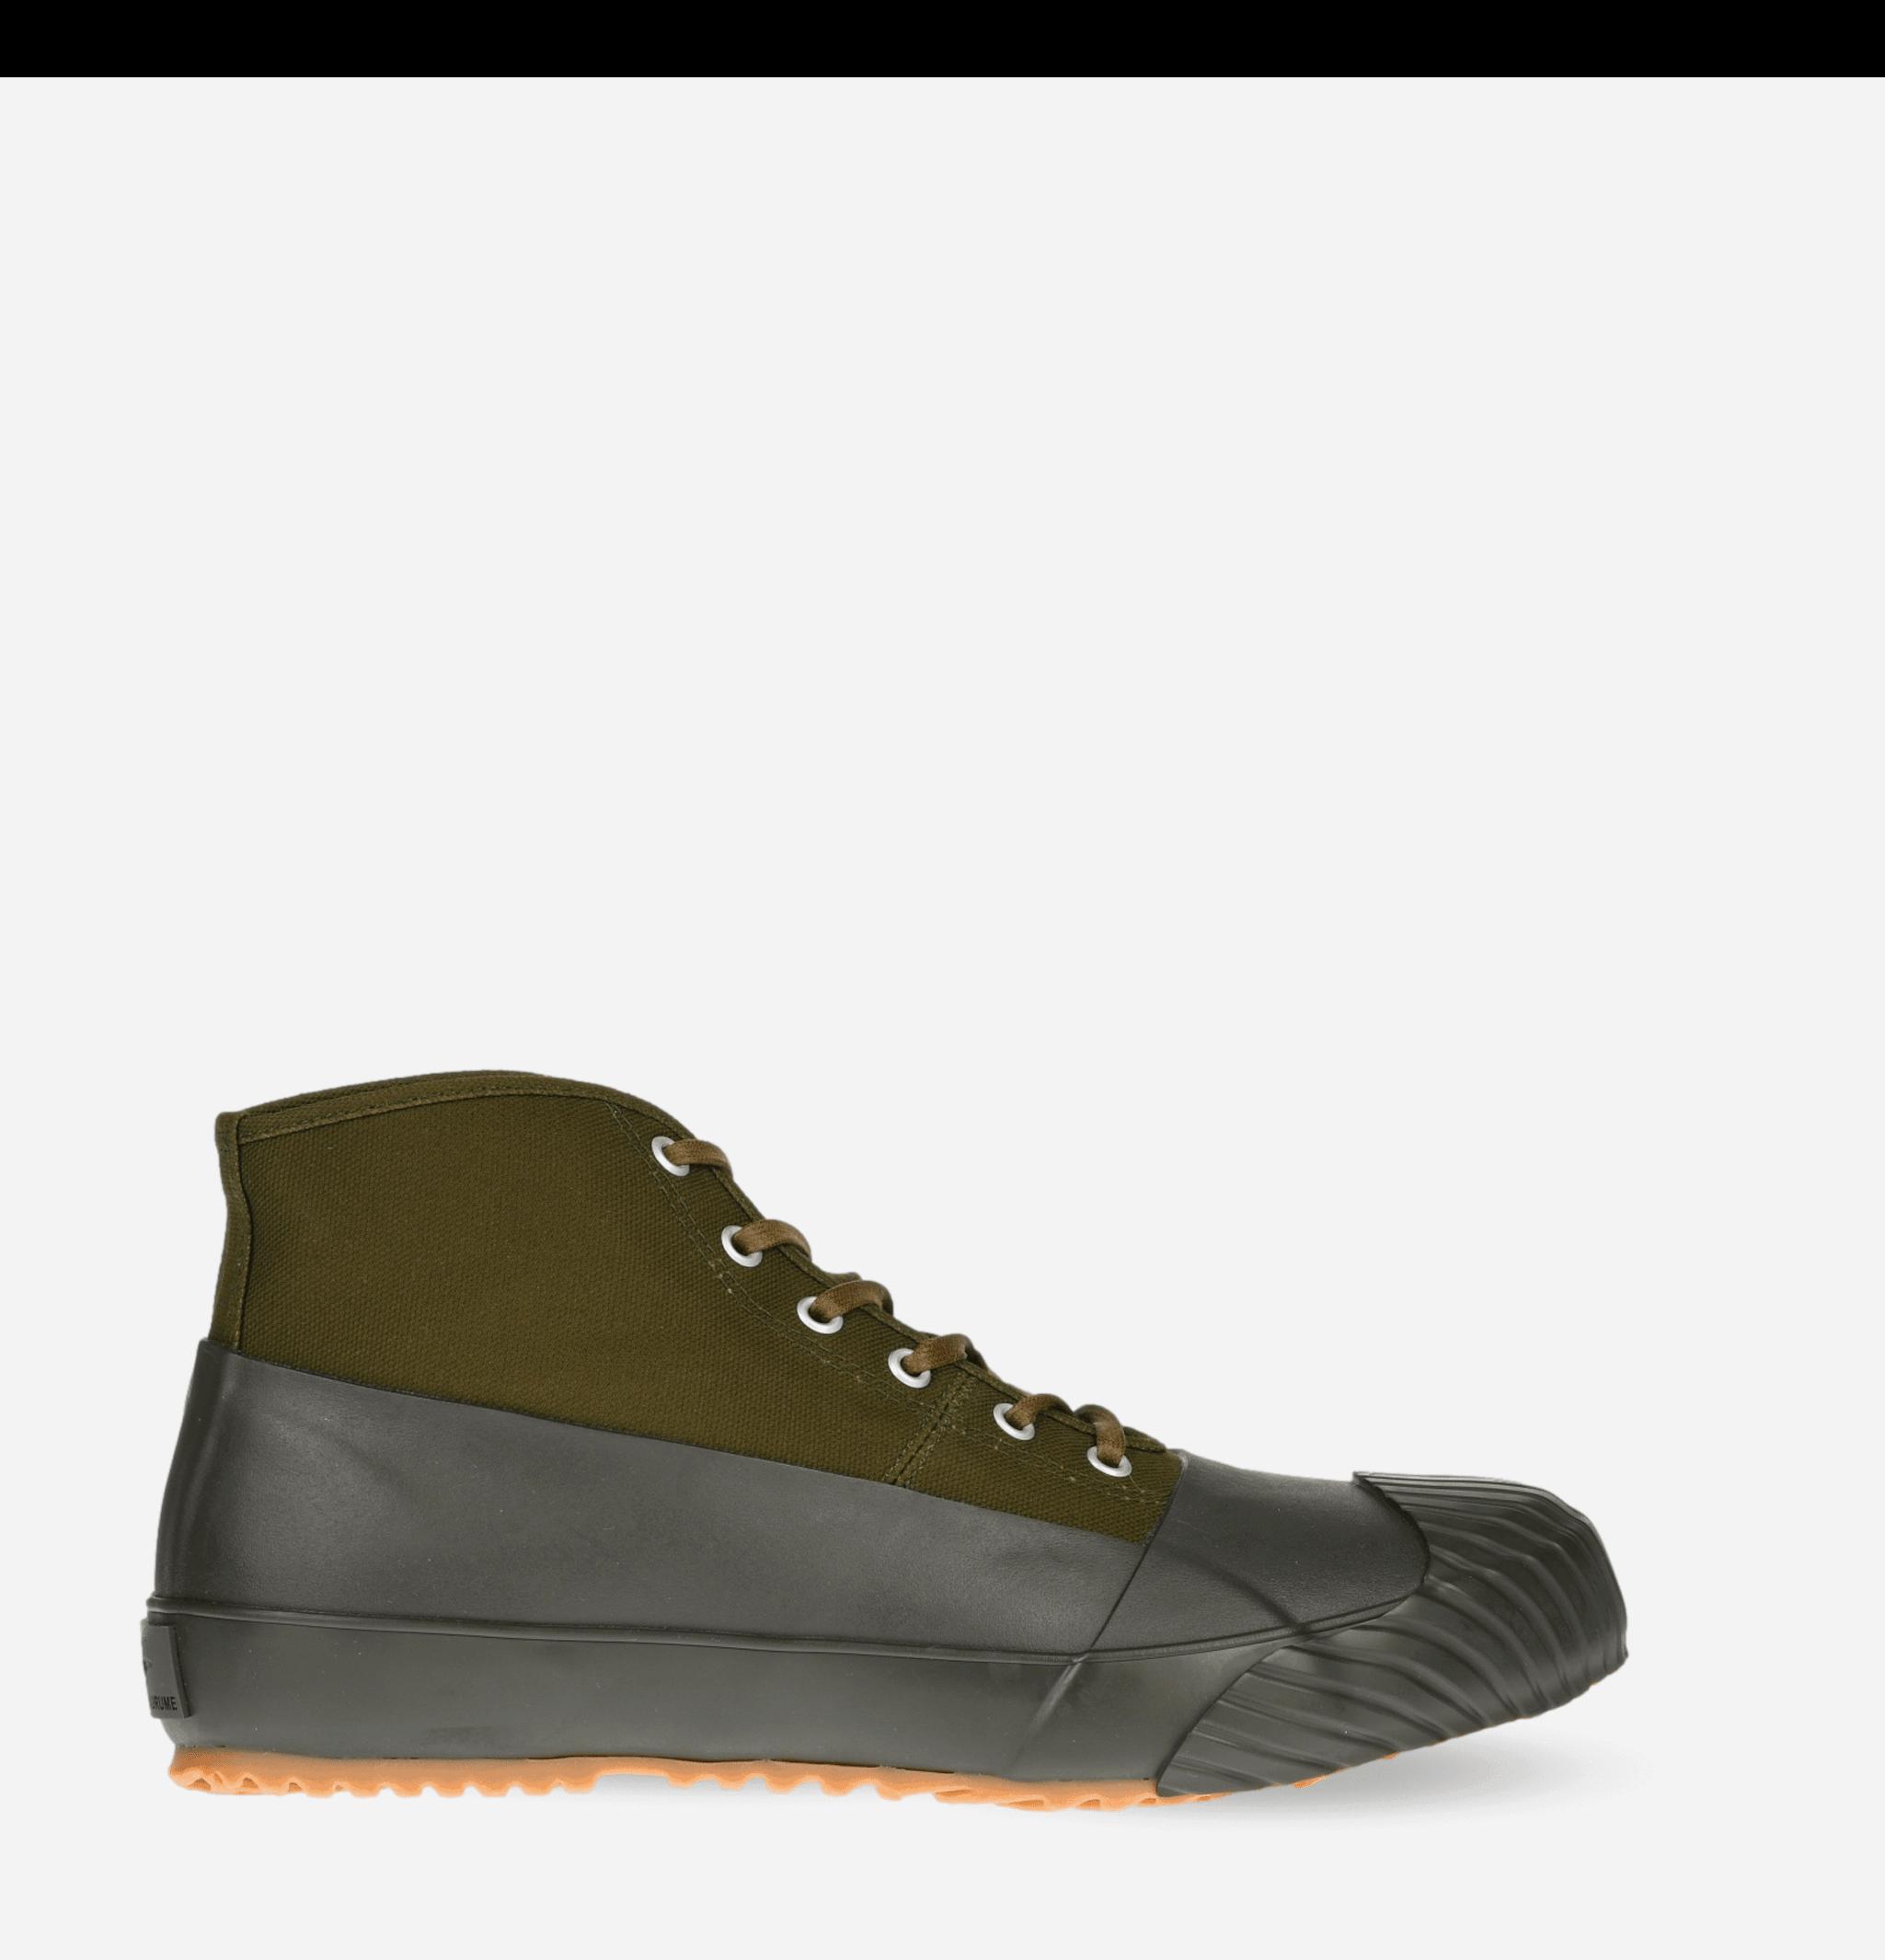 Allweather Boots Khaki